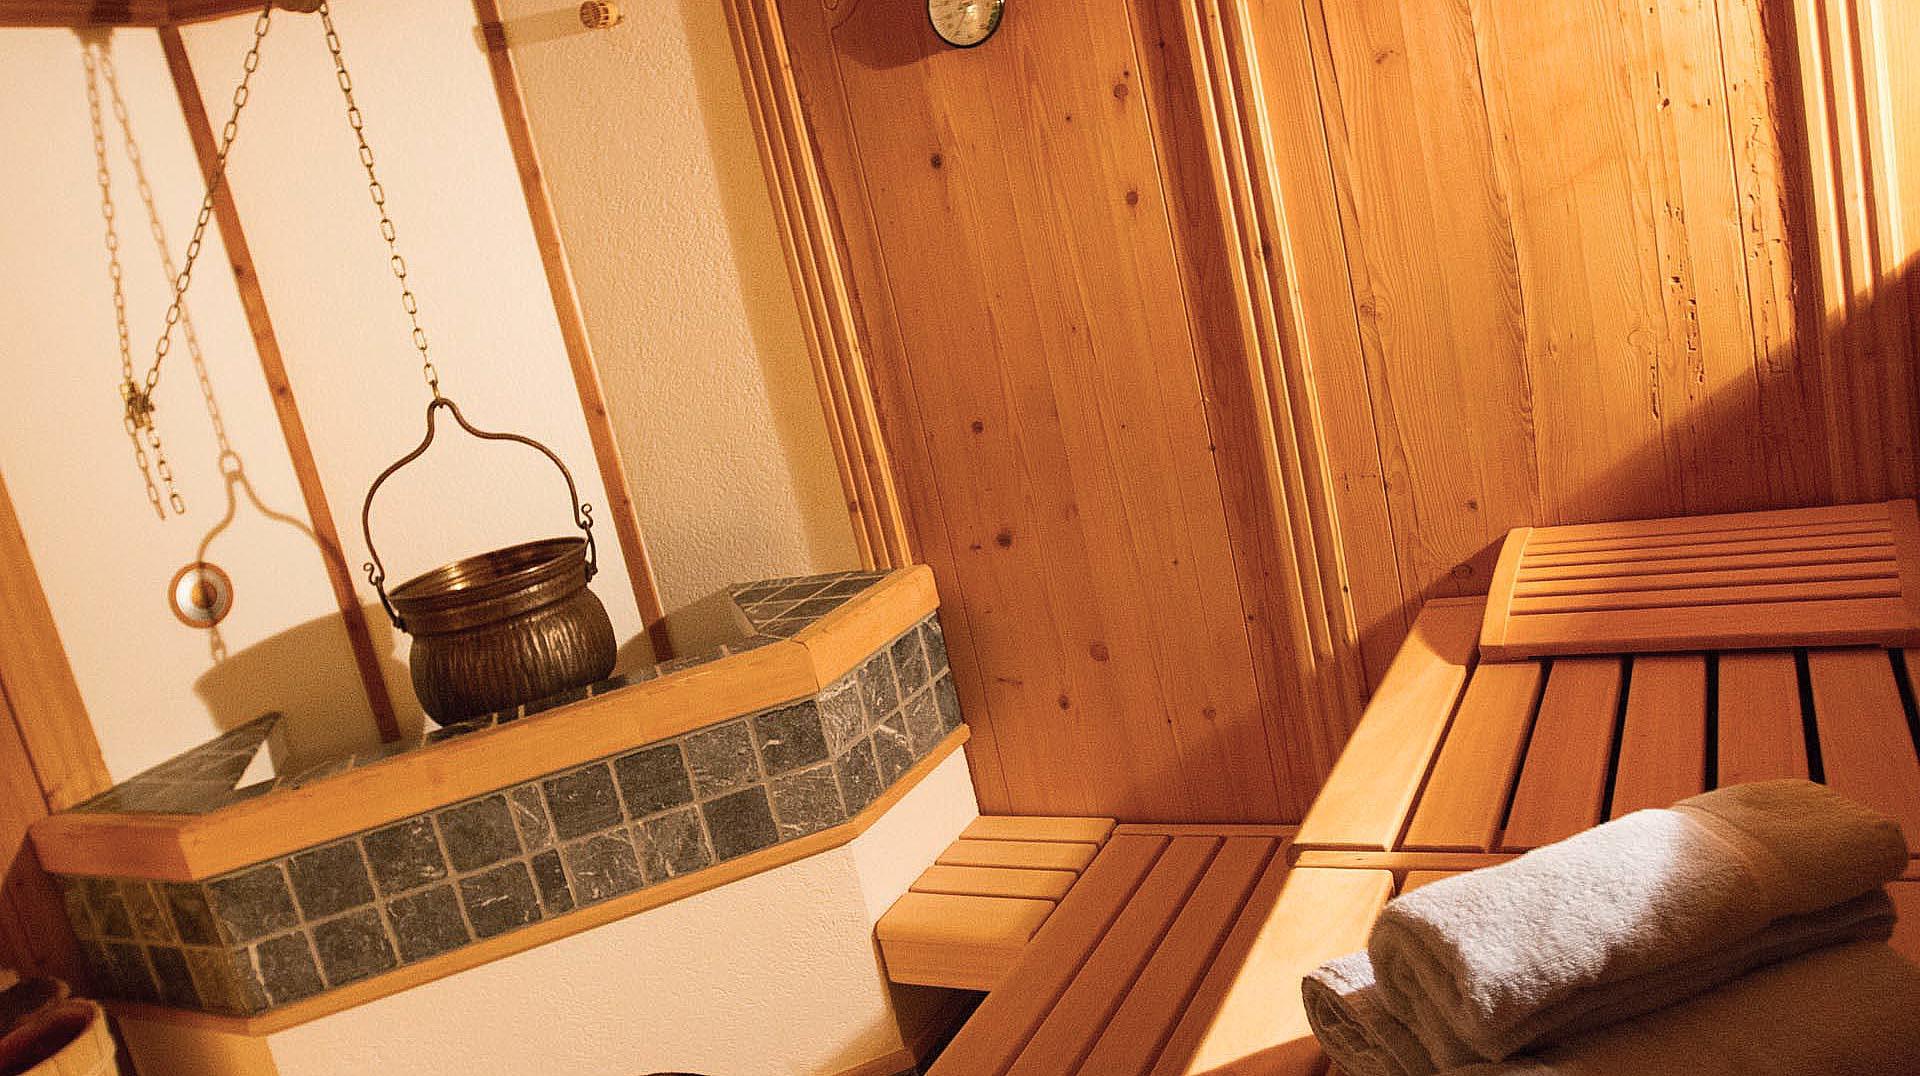 4 Sterne Hotel Albona Ischgl - Wellness